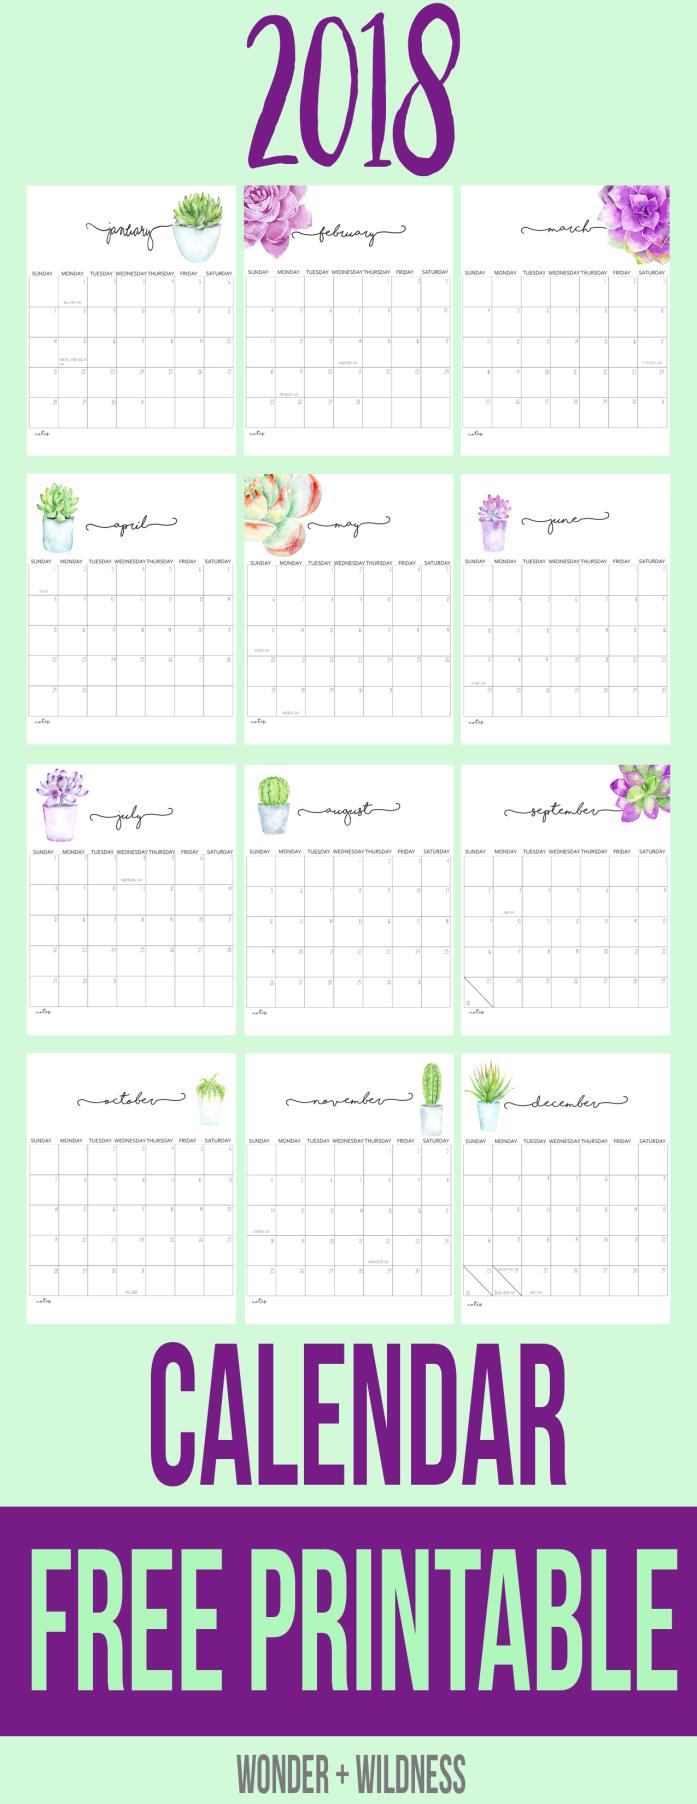 2018 printable calendar free